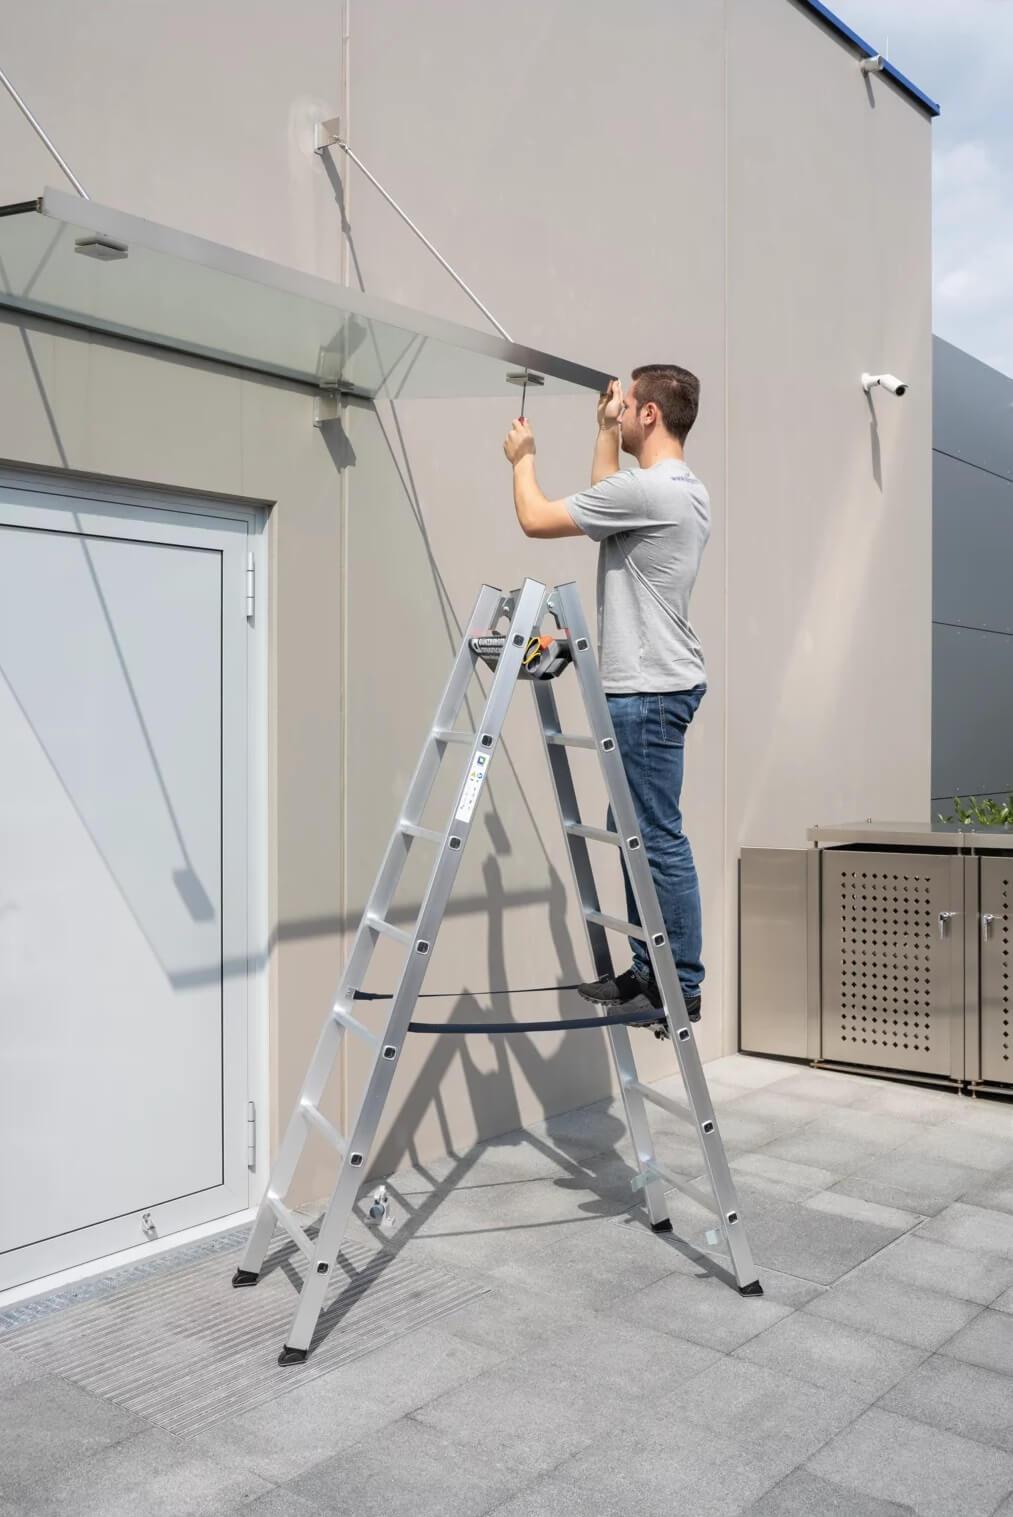 Dubbele ladder, artikelnummer 11154